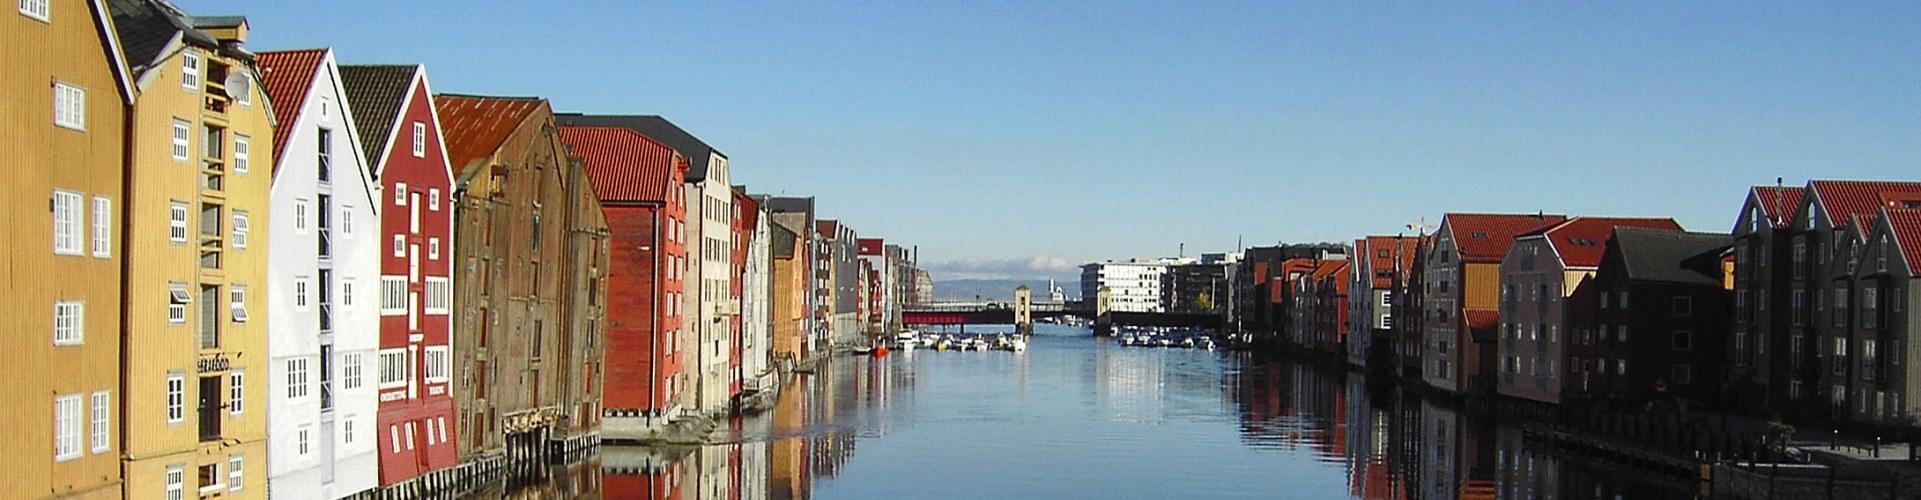 Søkemotoroptimalisering Trondheim